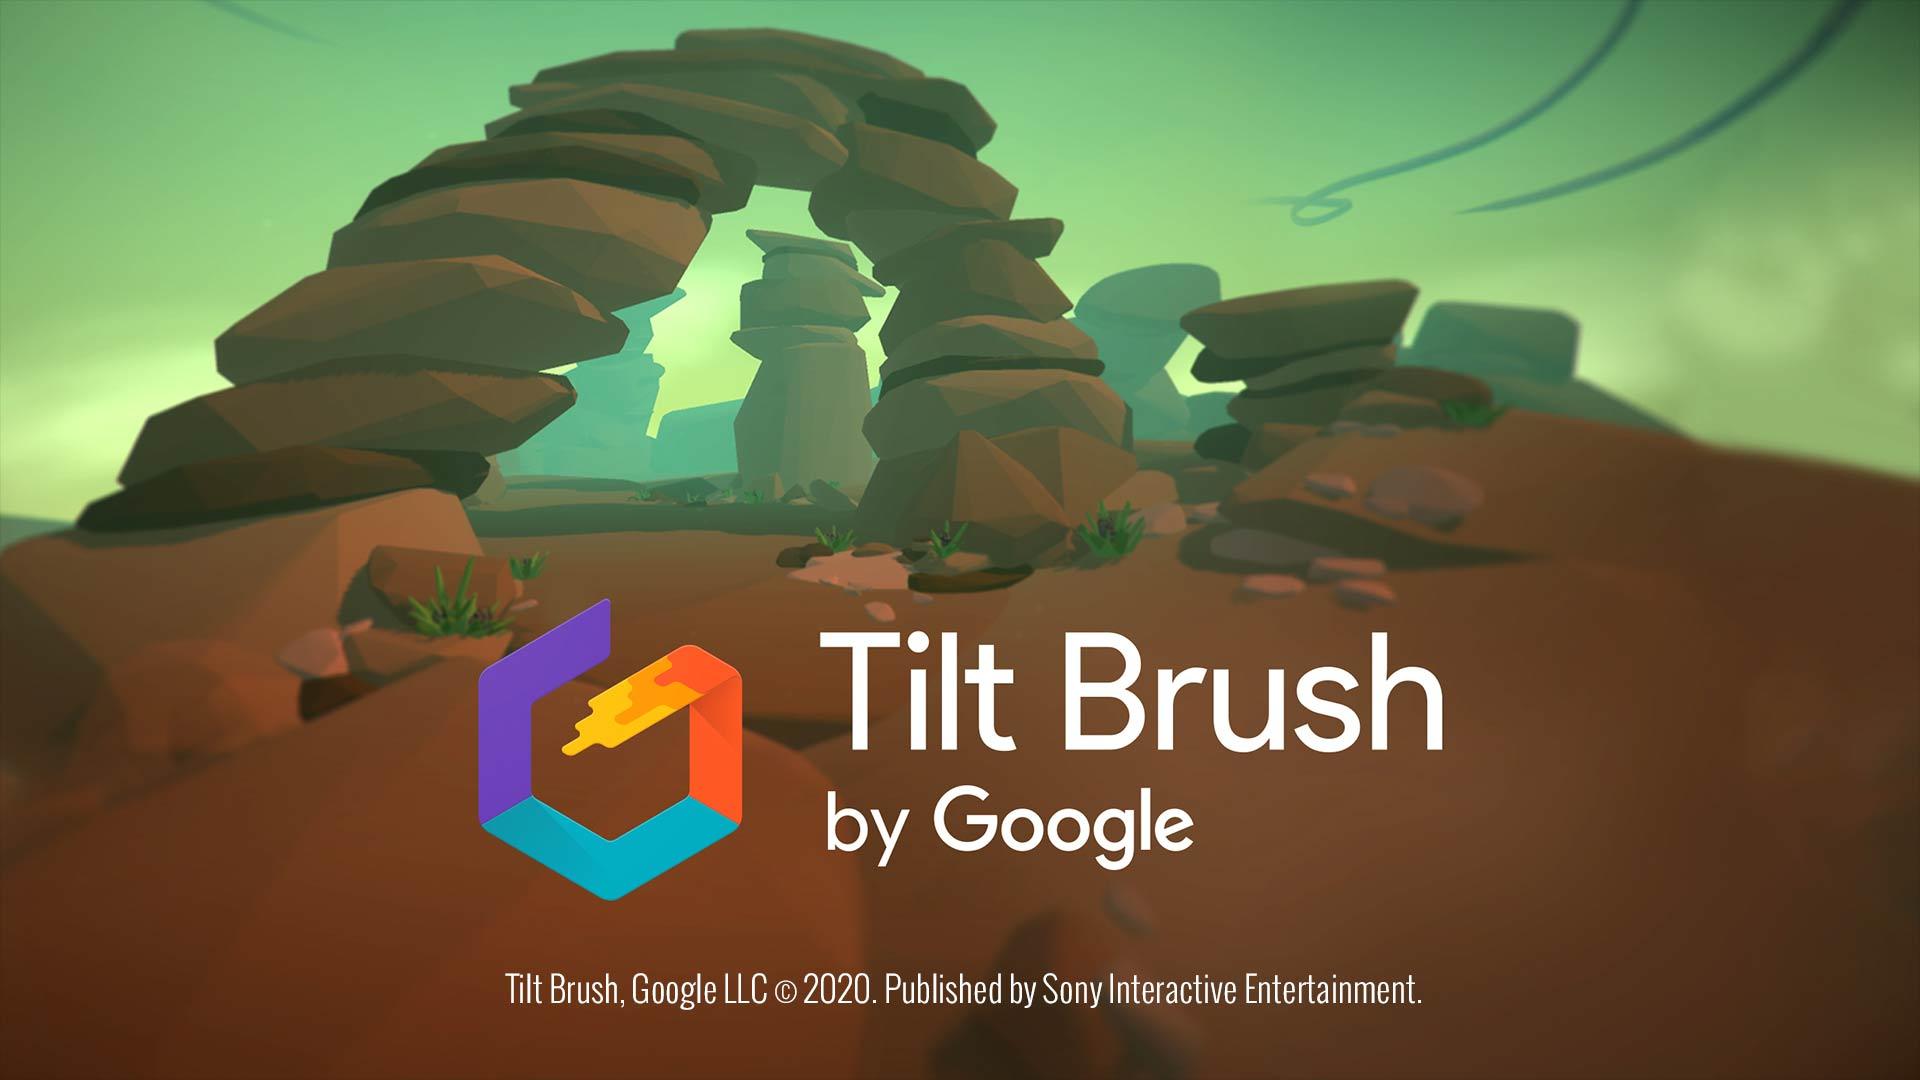 PSN数据表明谷歌旗下VR创作应用《Tilt Brush》即将登陆PSVR